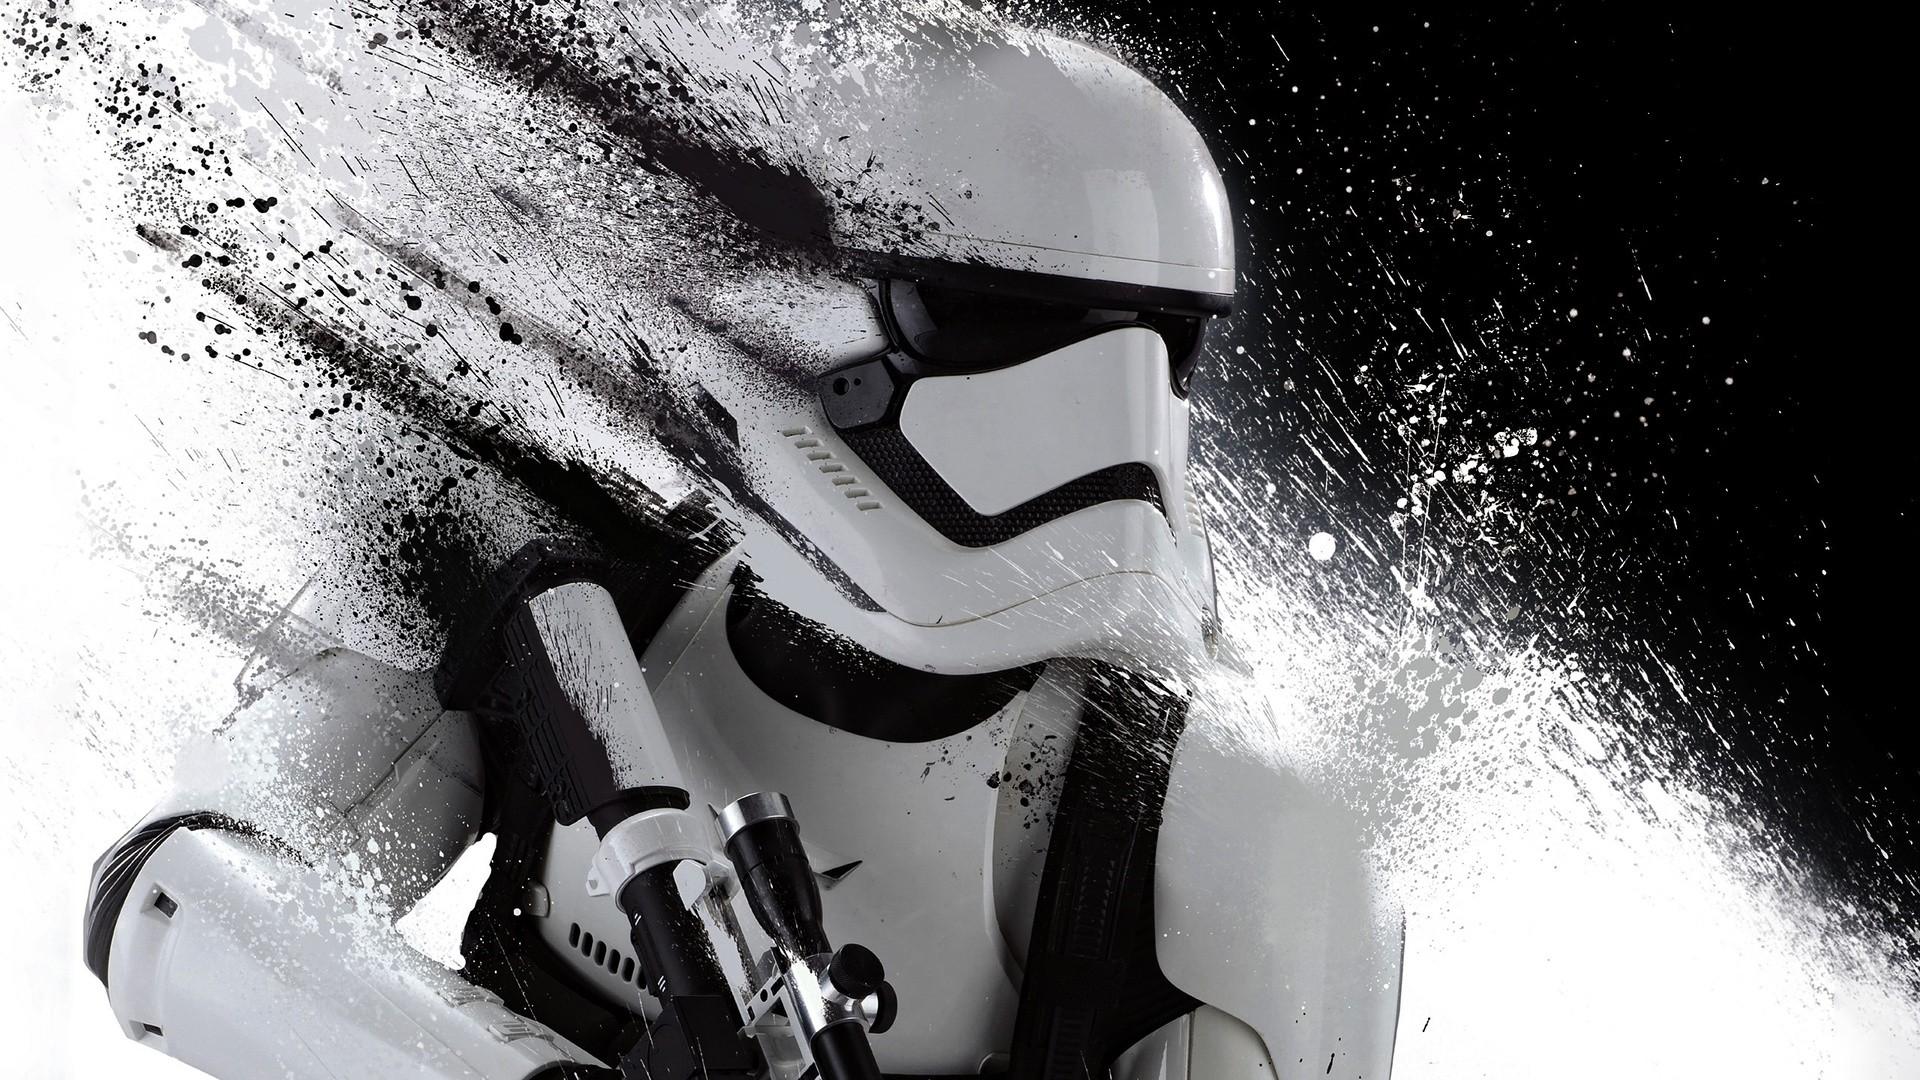 Stormtrooper Wallpaper Picture hd